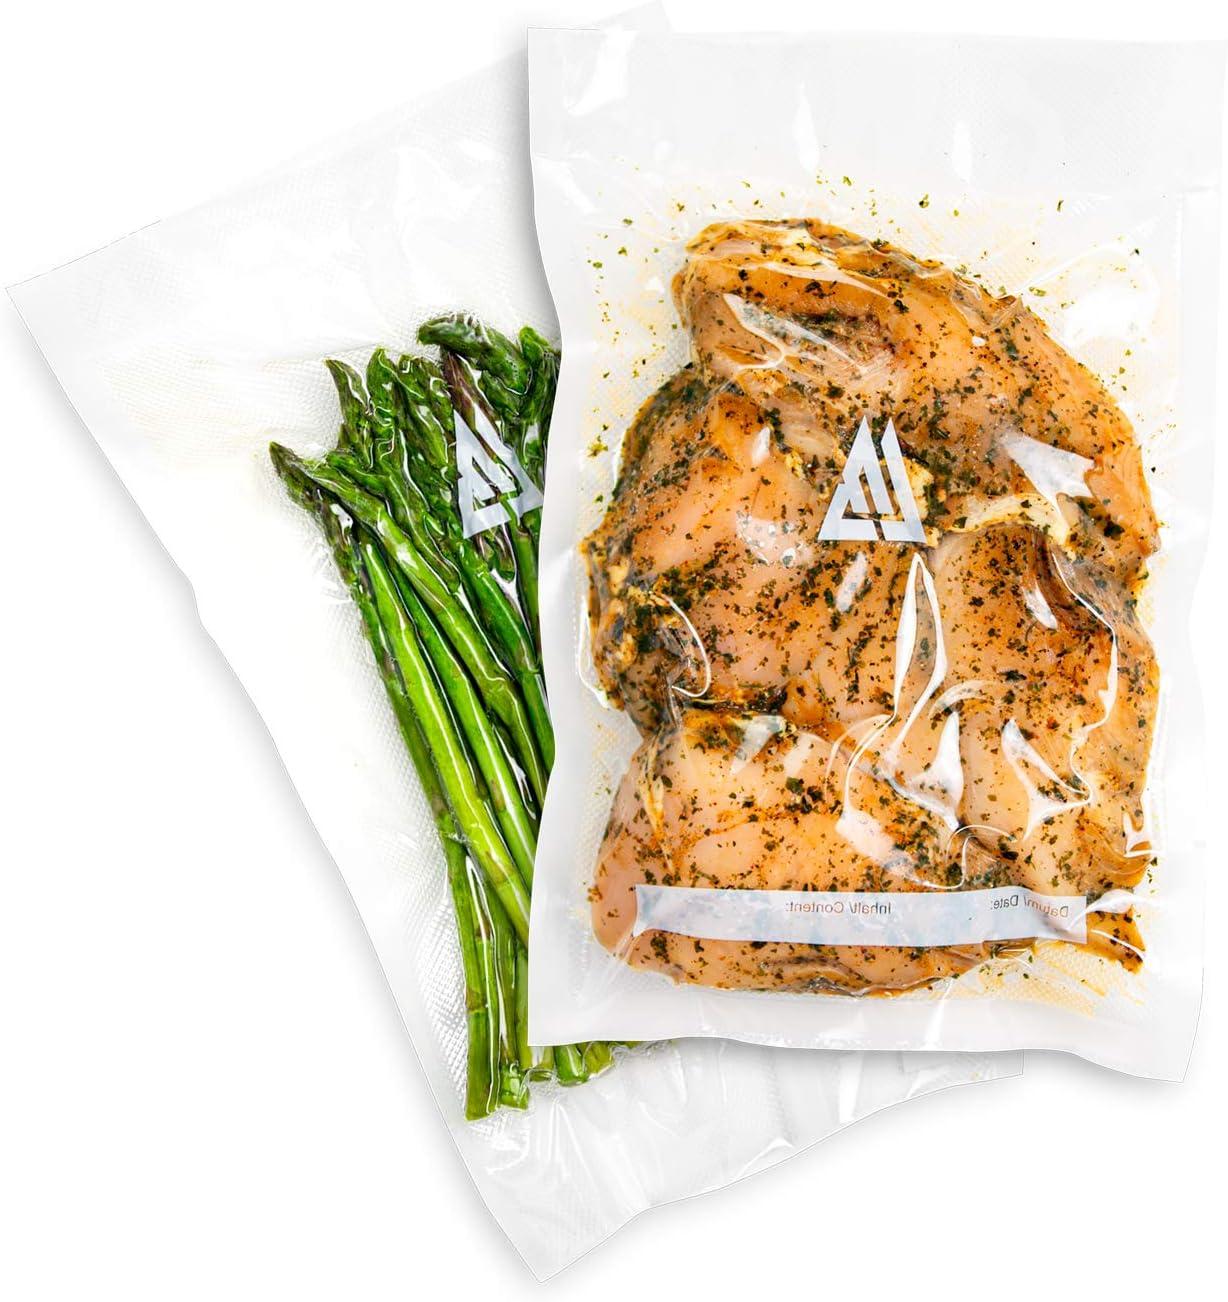 LivBettr Vacuum Sealer Bags for Food 8 x 12 inch, Sous Vide Bags, Vacuum Seal Food Storage Bag, Pre Cut BPA Free Food Grade, Freezer and Microwave Safe, Premium Quality, 100 Count